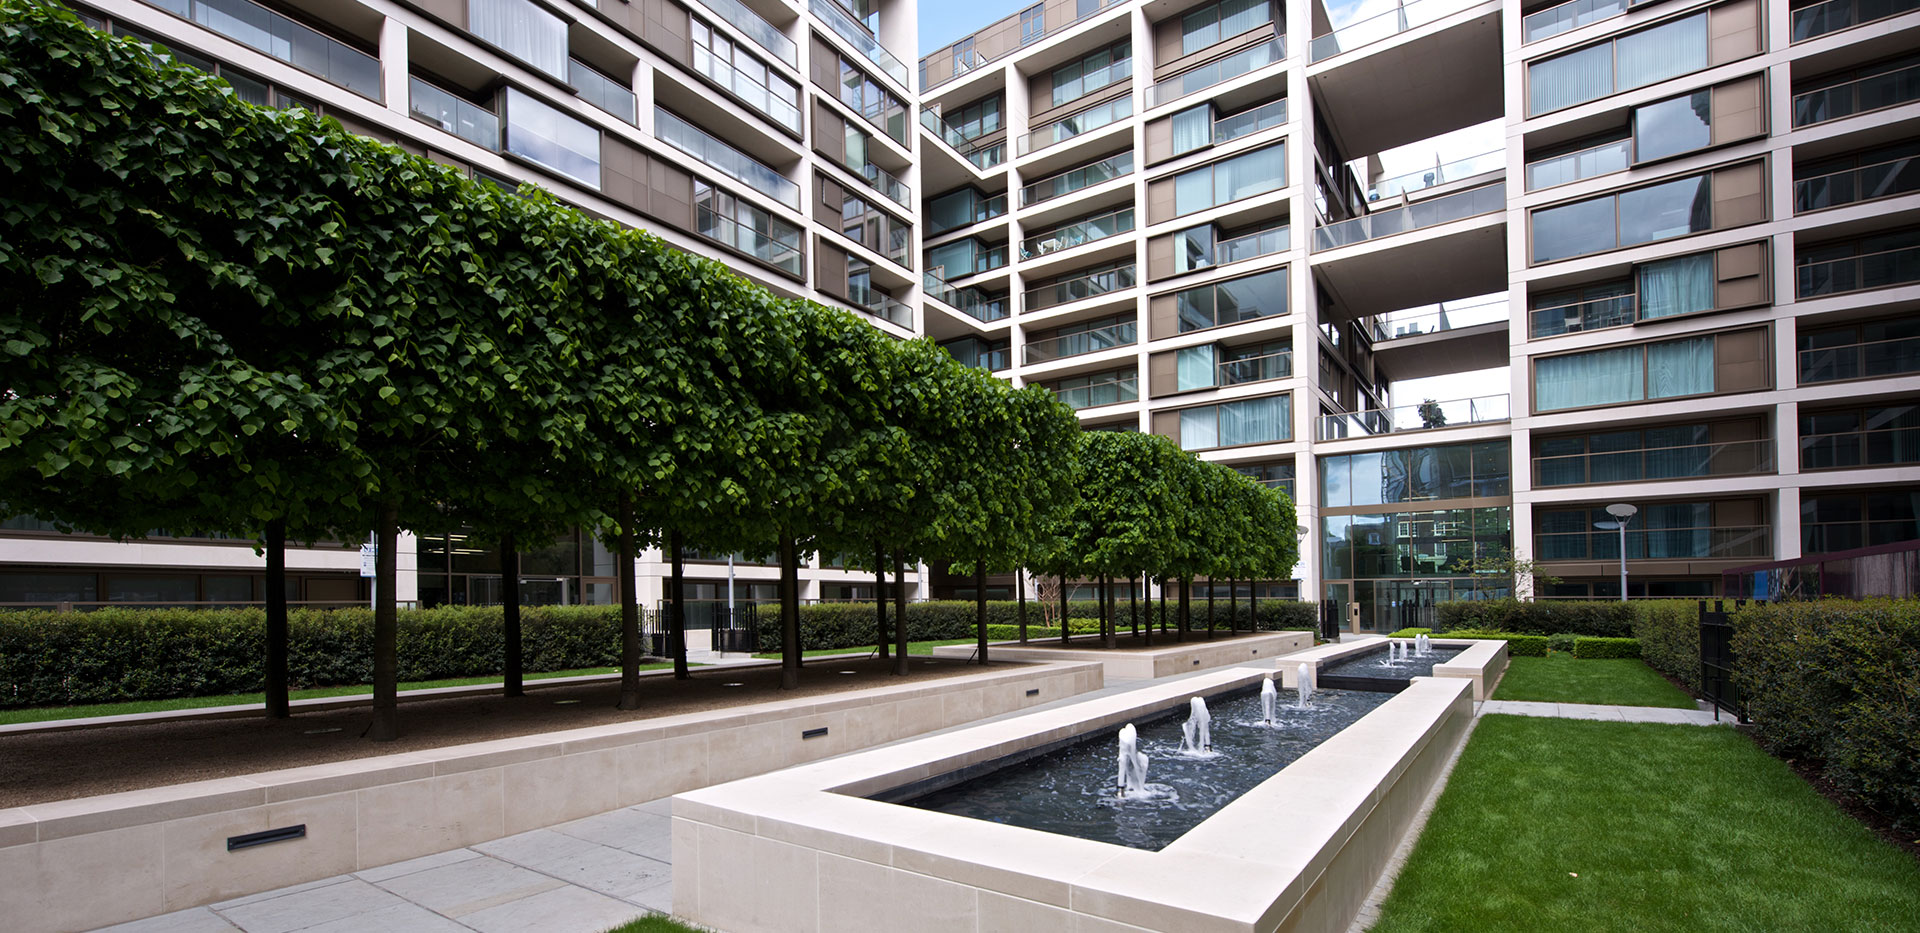 375 Kensington High Street, Benson House, Penthouse Show Apartment, Hallway, Interior